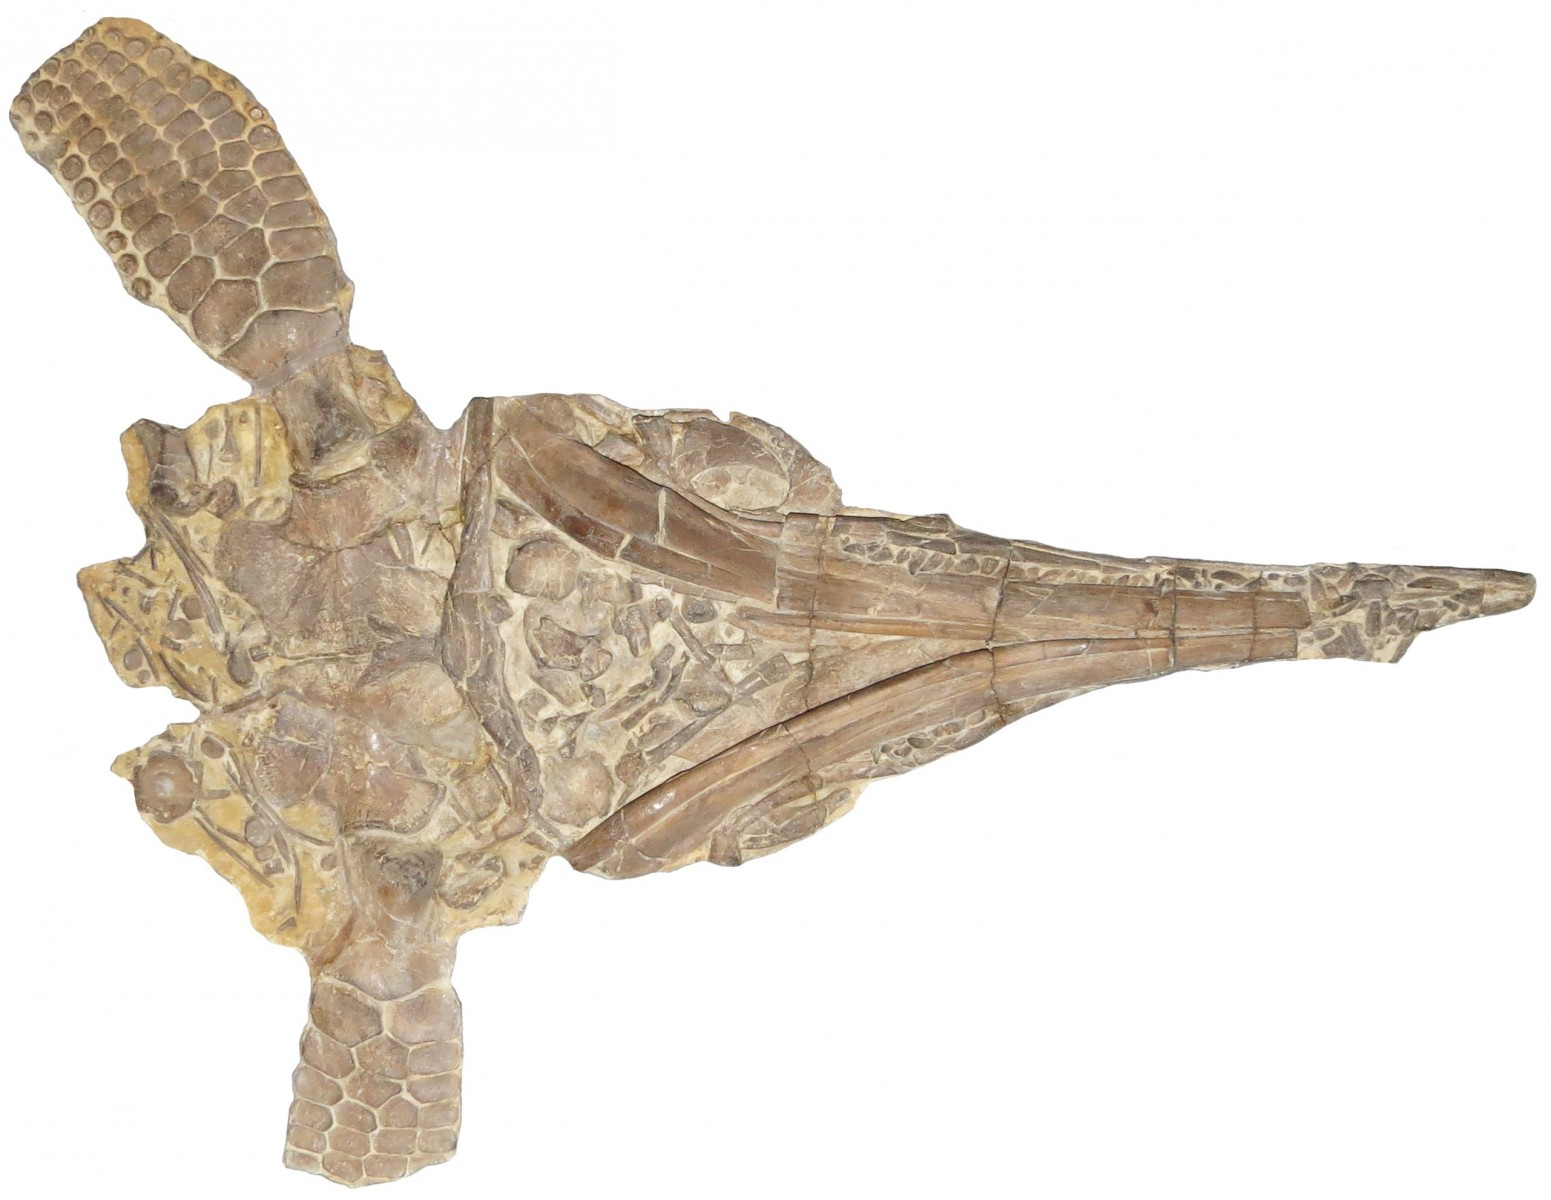 Protoichthyosaurus